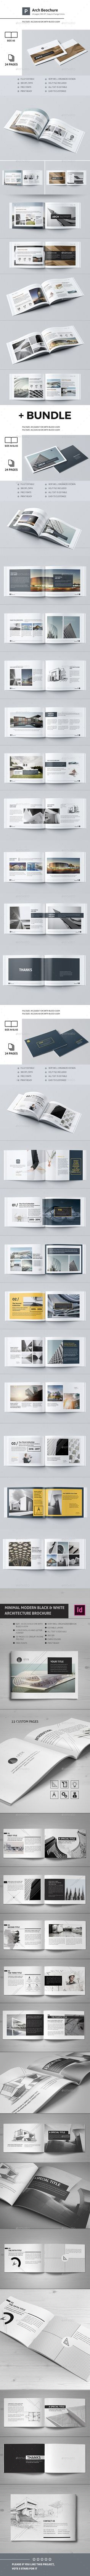 New Modern Architecture Brochure + Bundle — InDesign INDD #modern #logo • Download ➝ https://graphicriver.net/item/new-modern-architecture-brochure-bundle/18814312?ref=pxcr